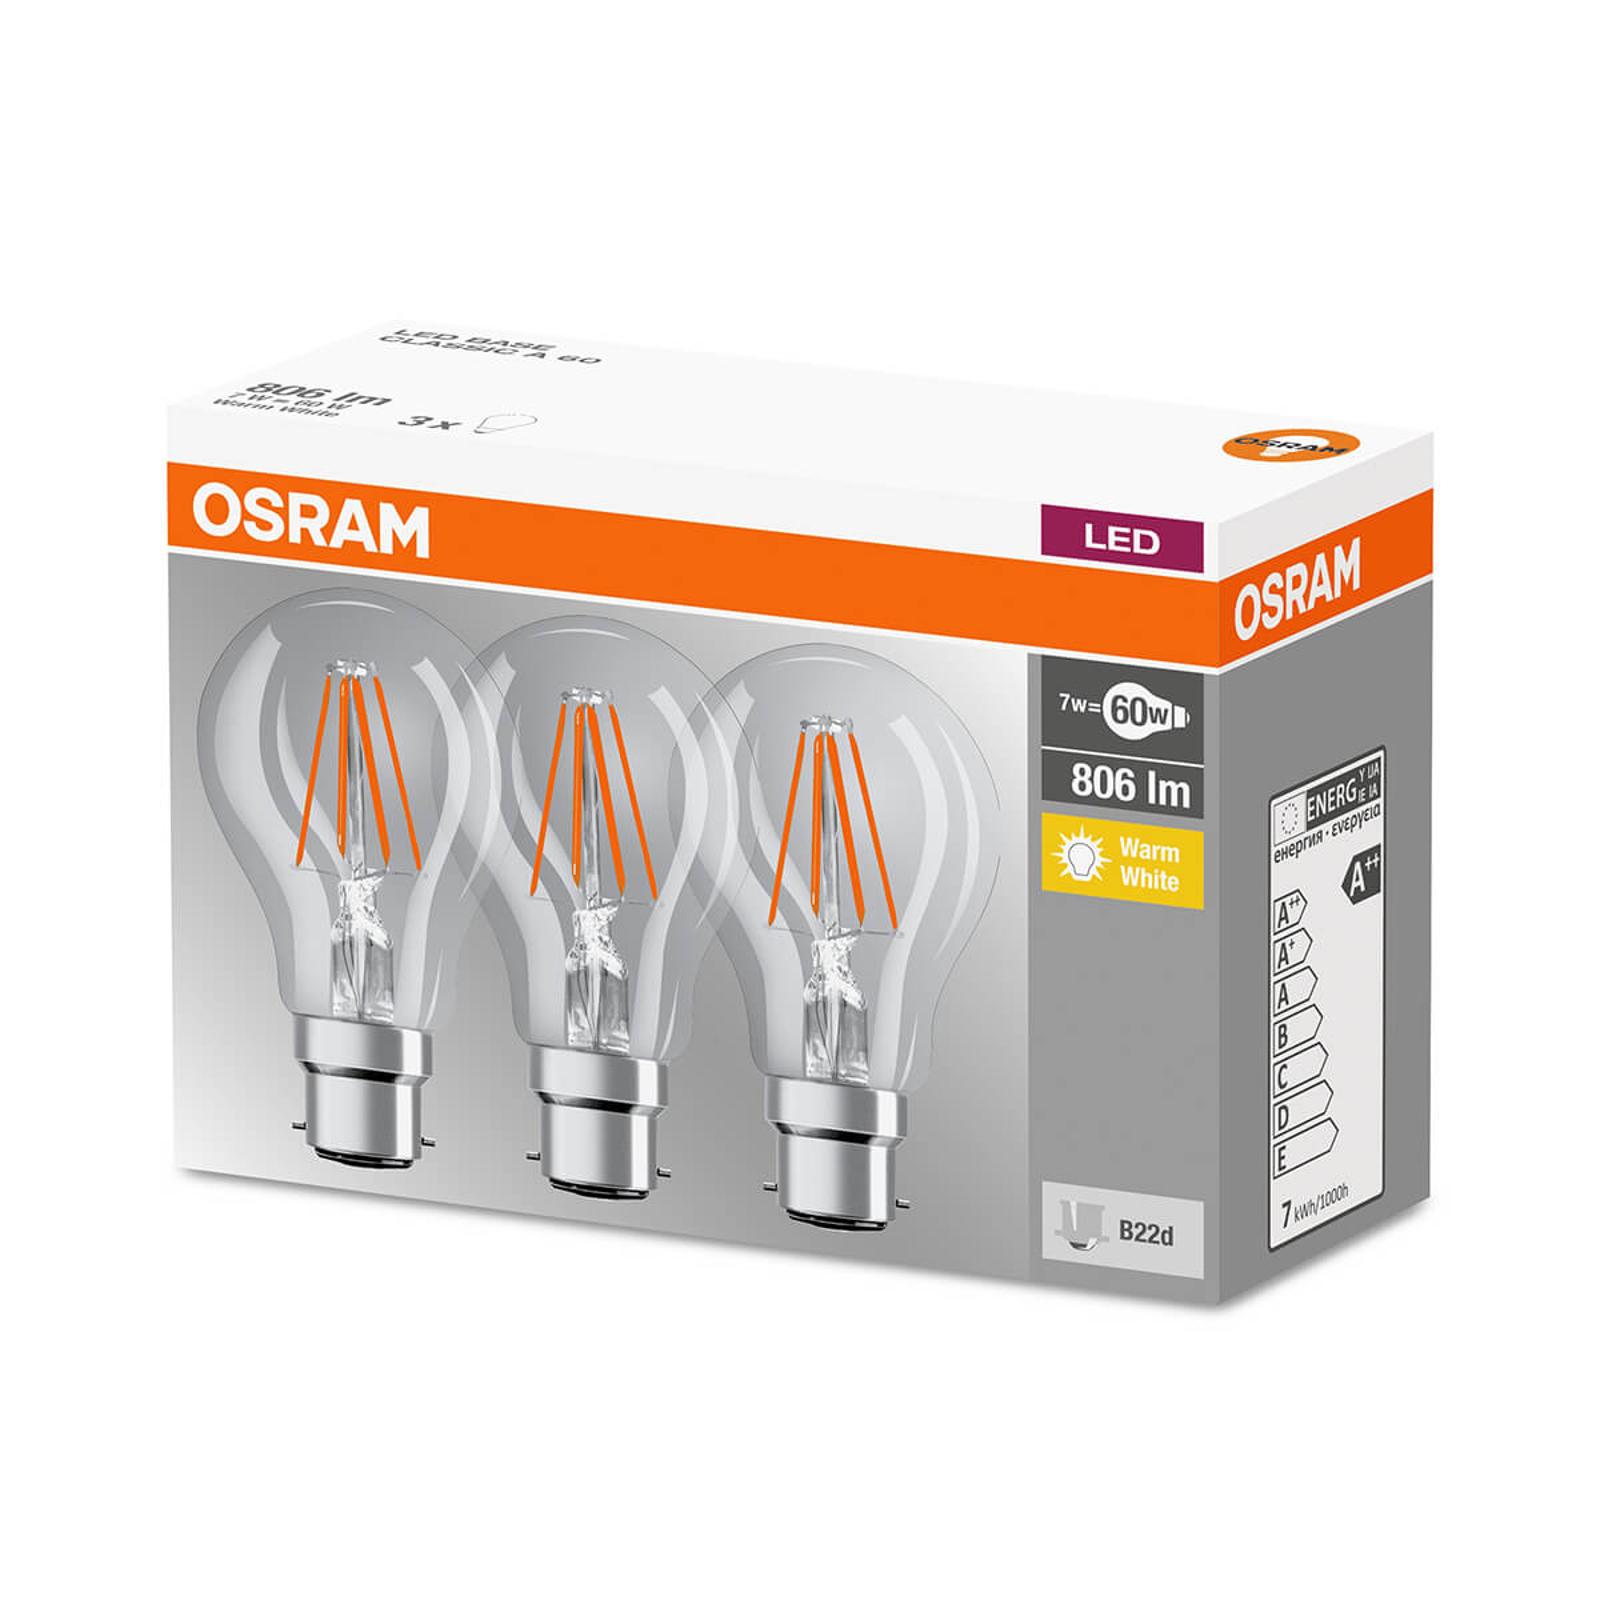 LED-Filamentlampe B22d 7W, warmweiß, 3er-Set